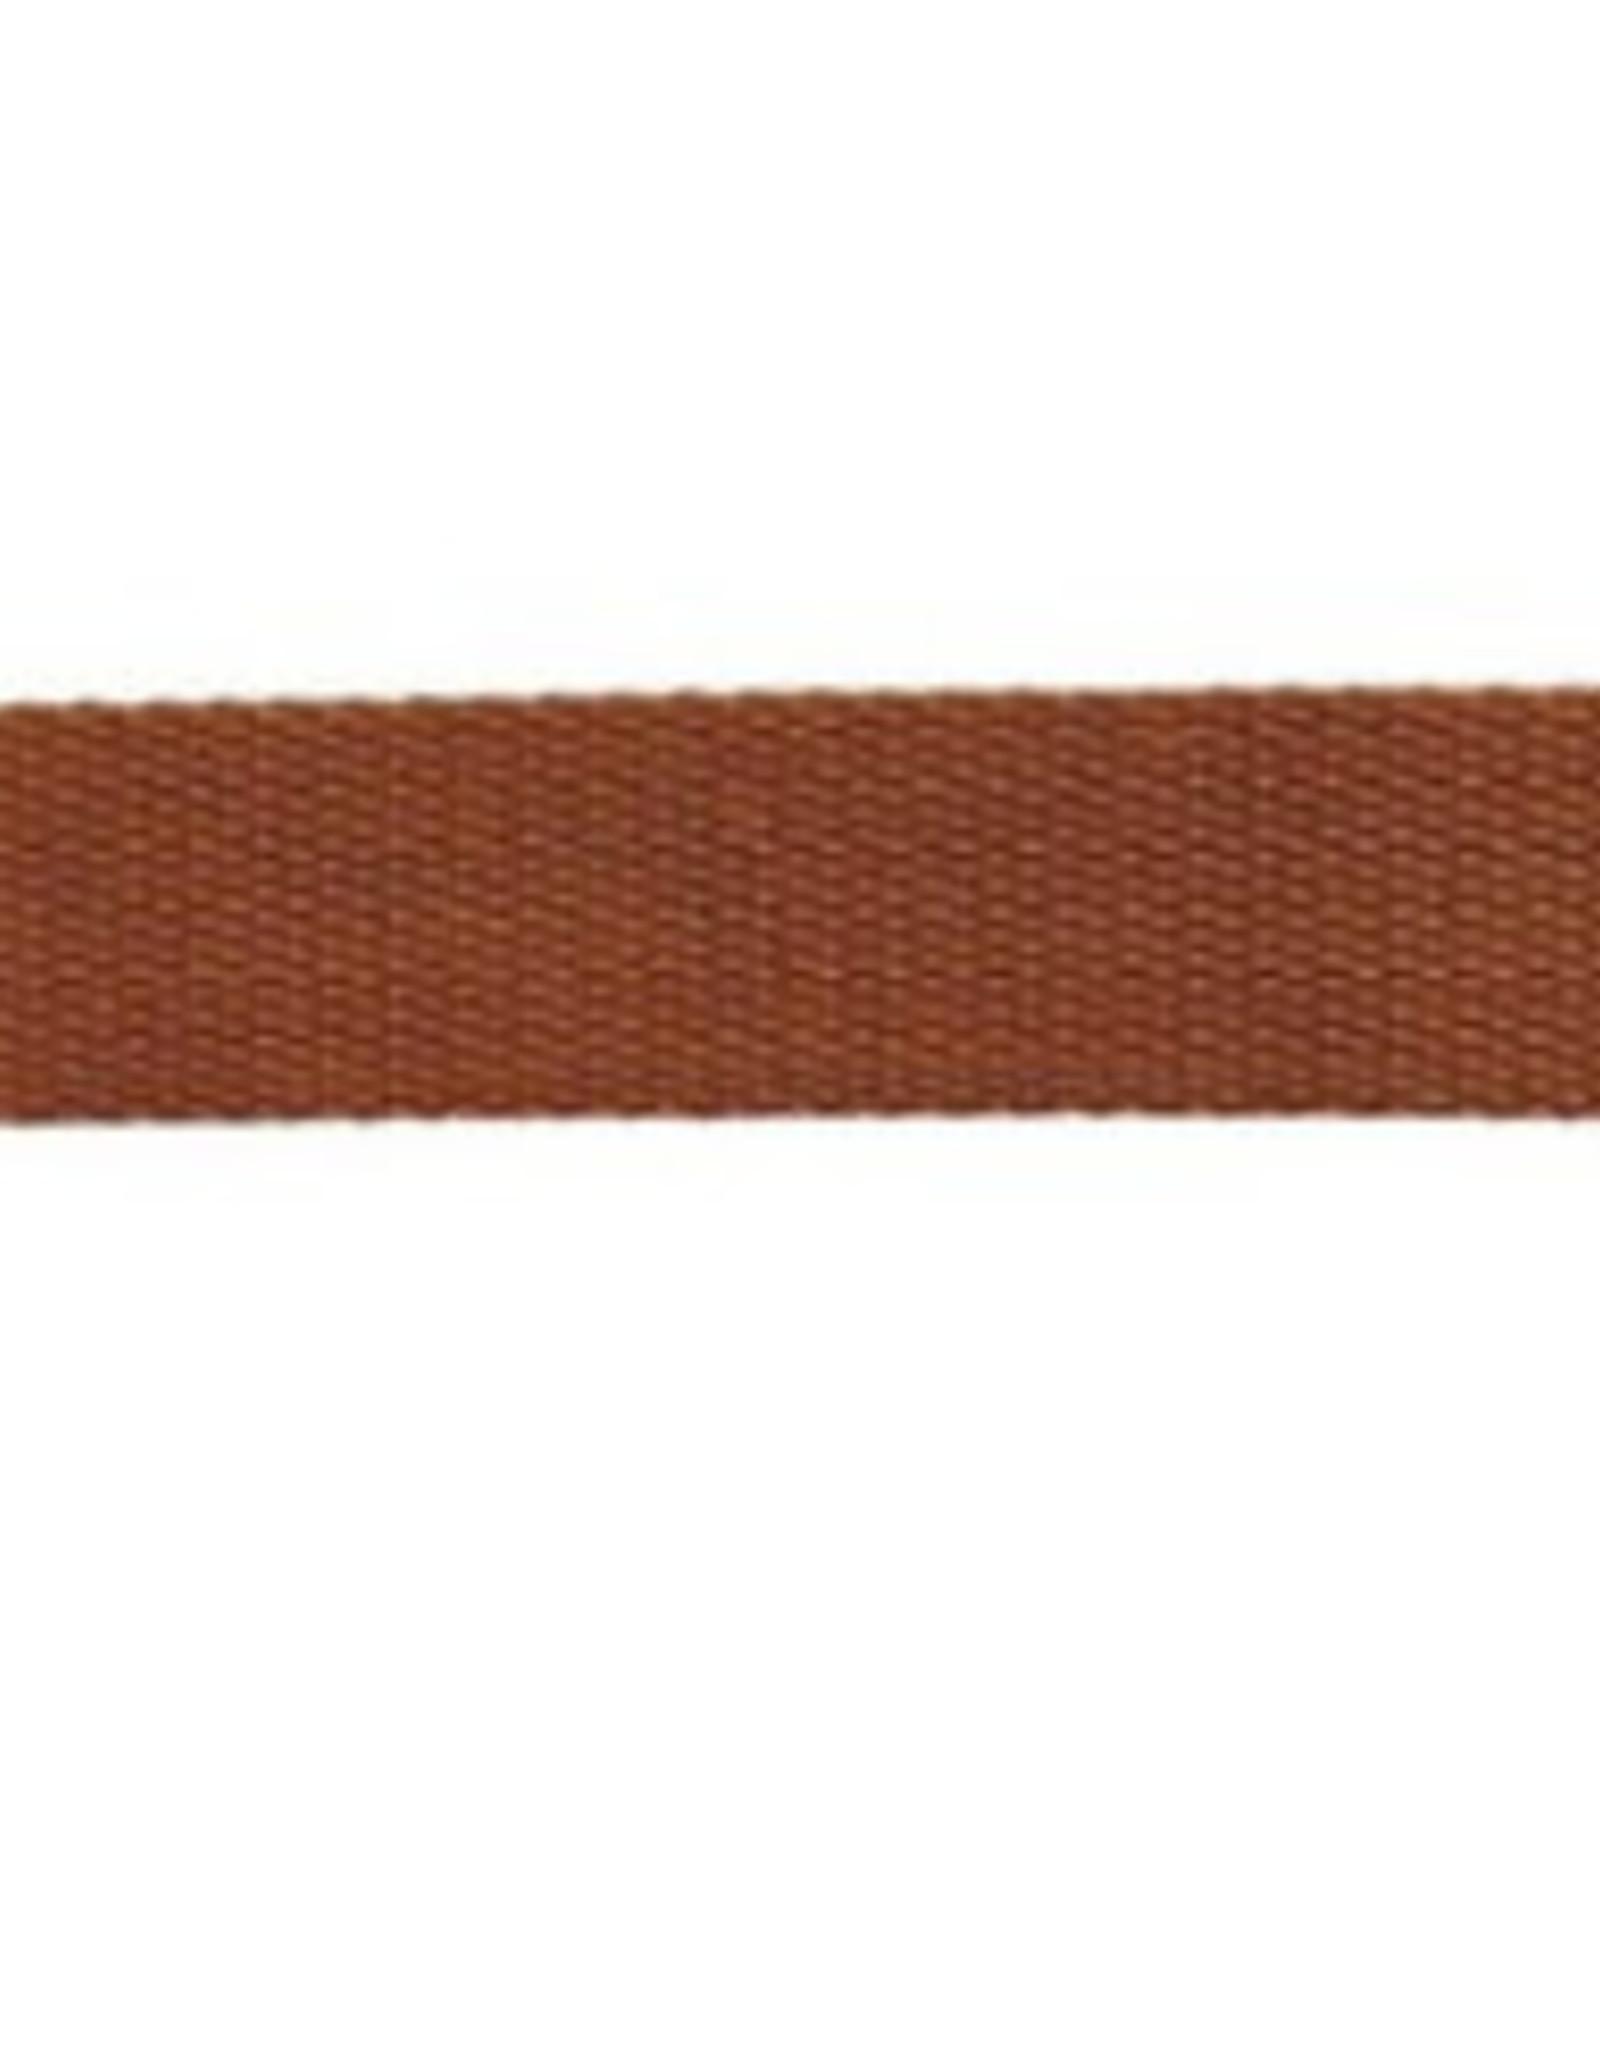 Rico Design Tassenband - Marron - 25mm - 2m